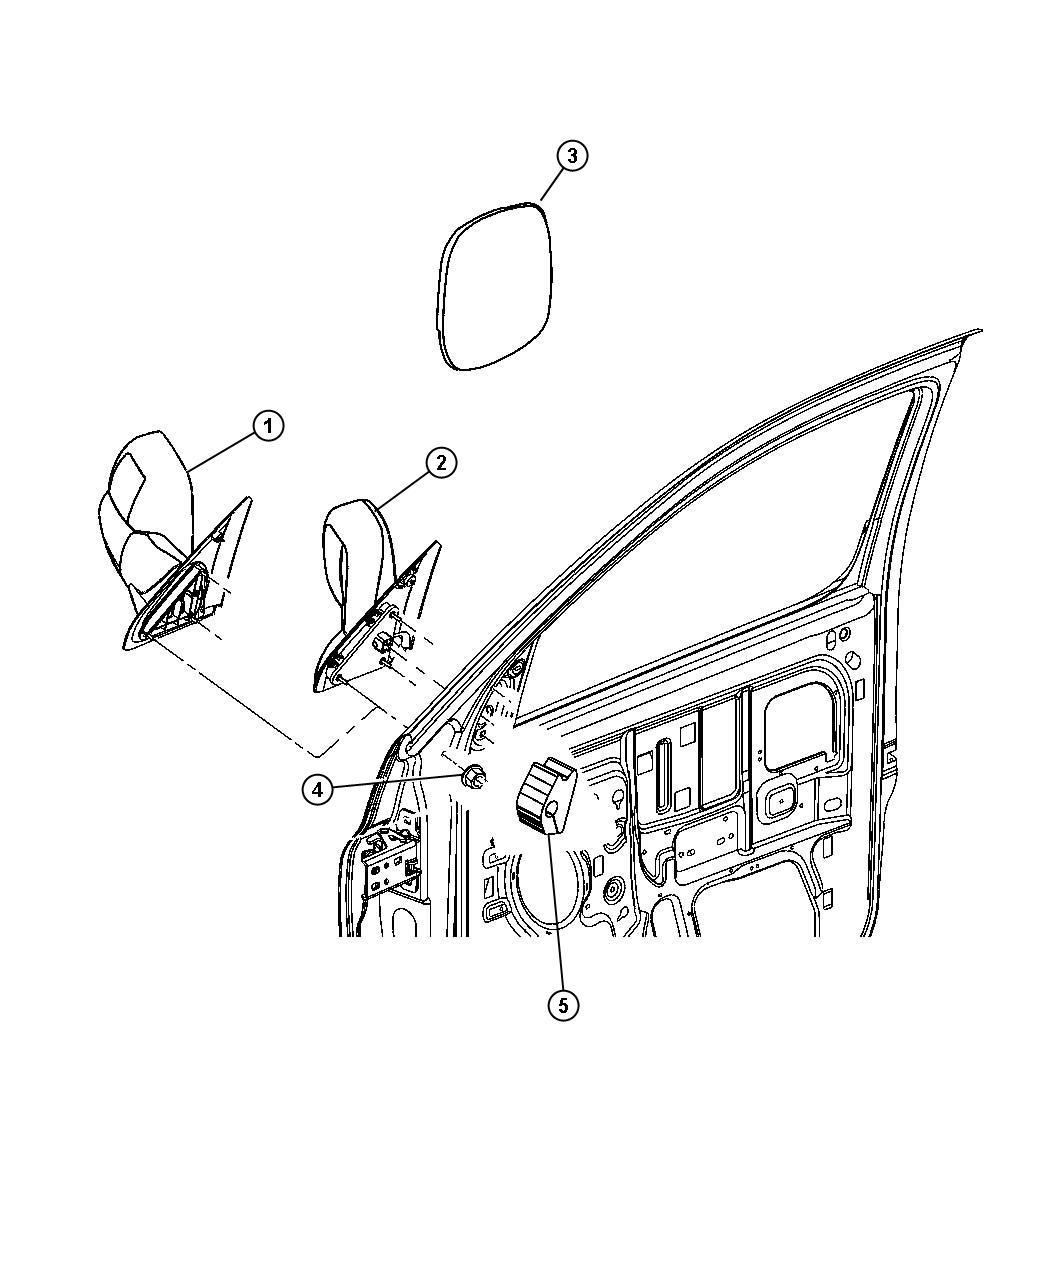 2008 dodge ram 1500 slt quad cab 5 7l hemi v8 a  t 4x4 mirror  outside rearview  right